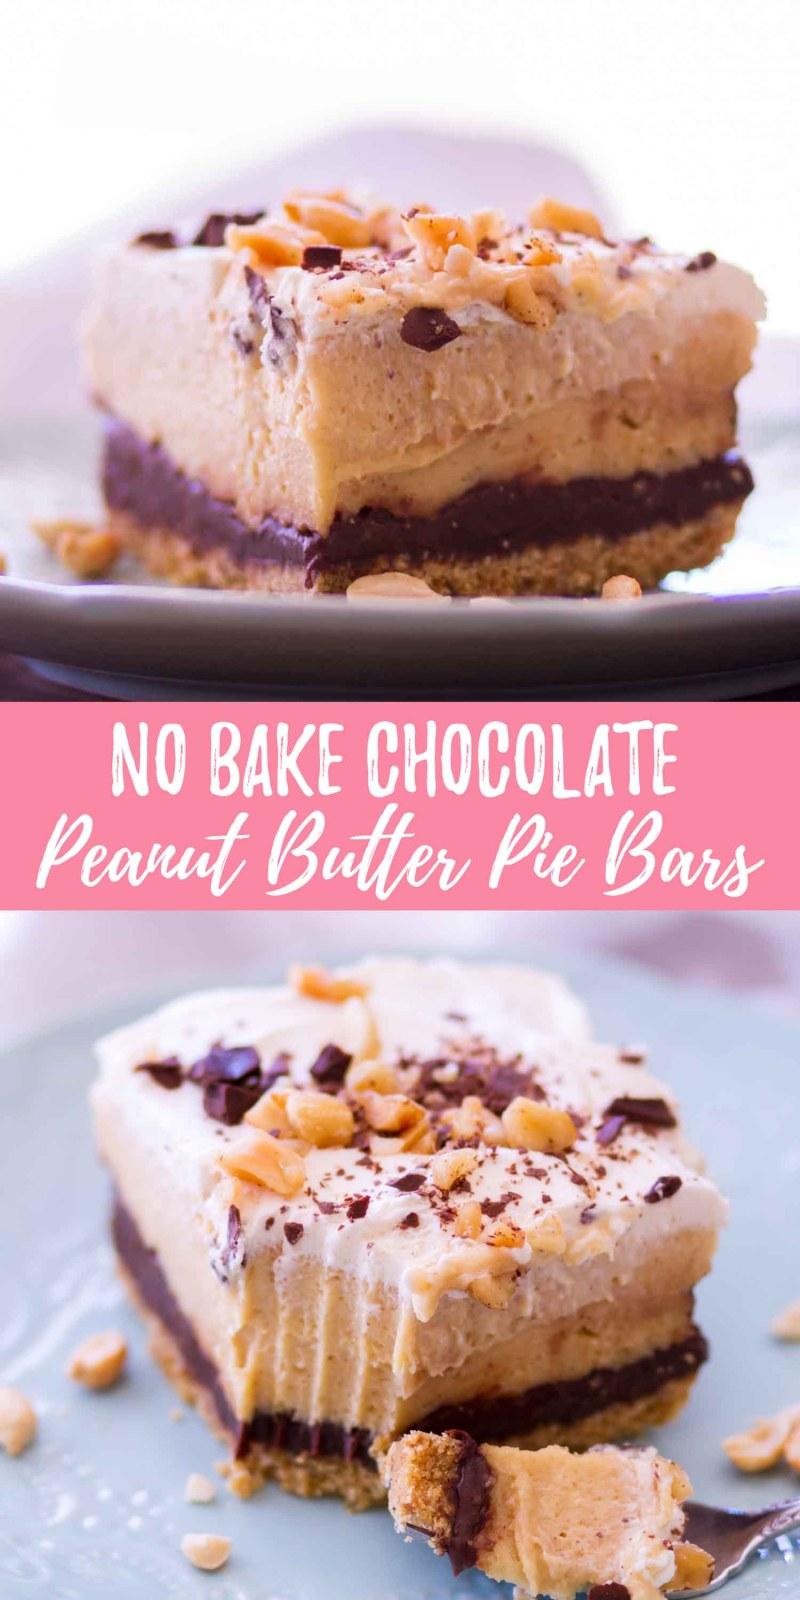 No Bake Chocolate Peanut Butter Pie Bars